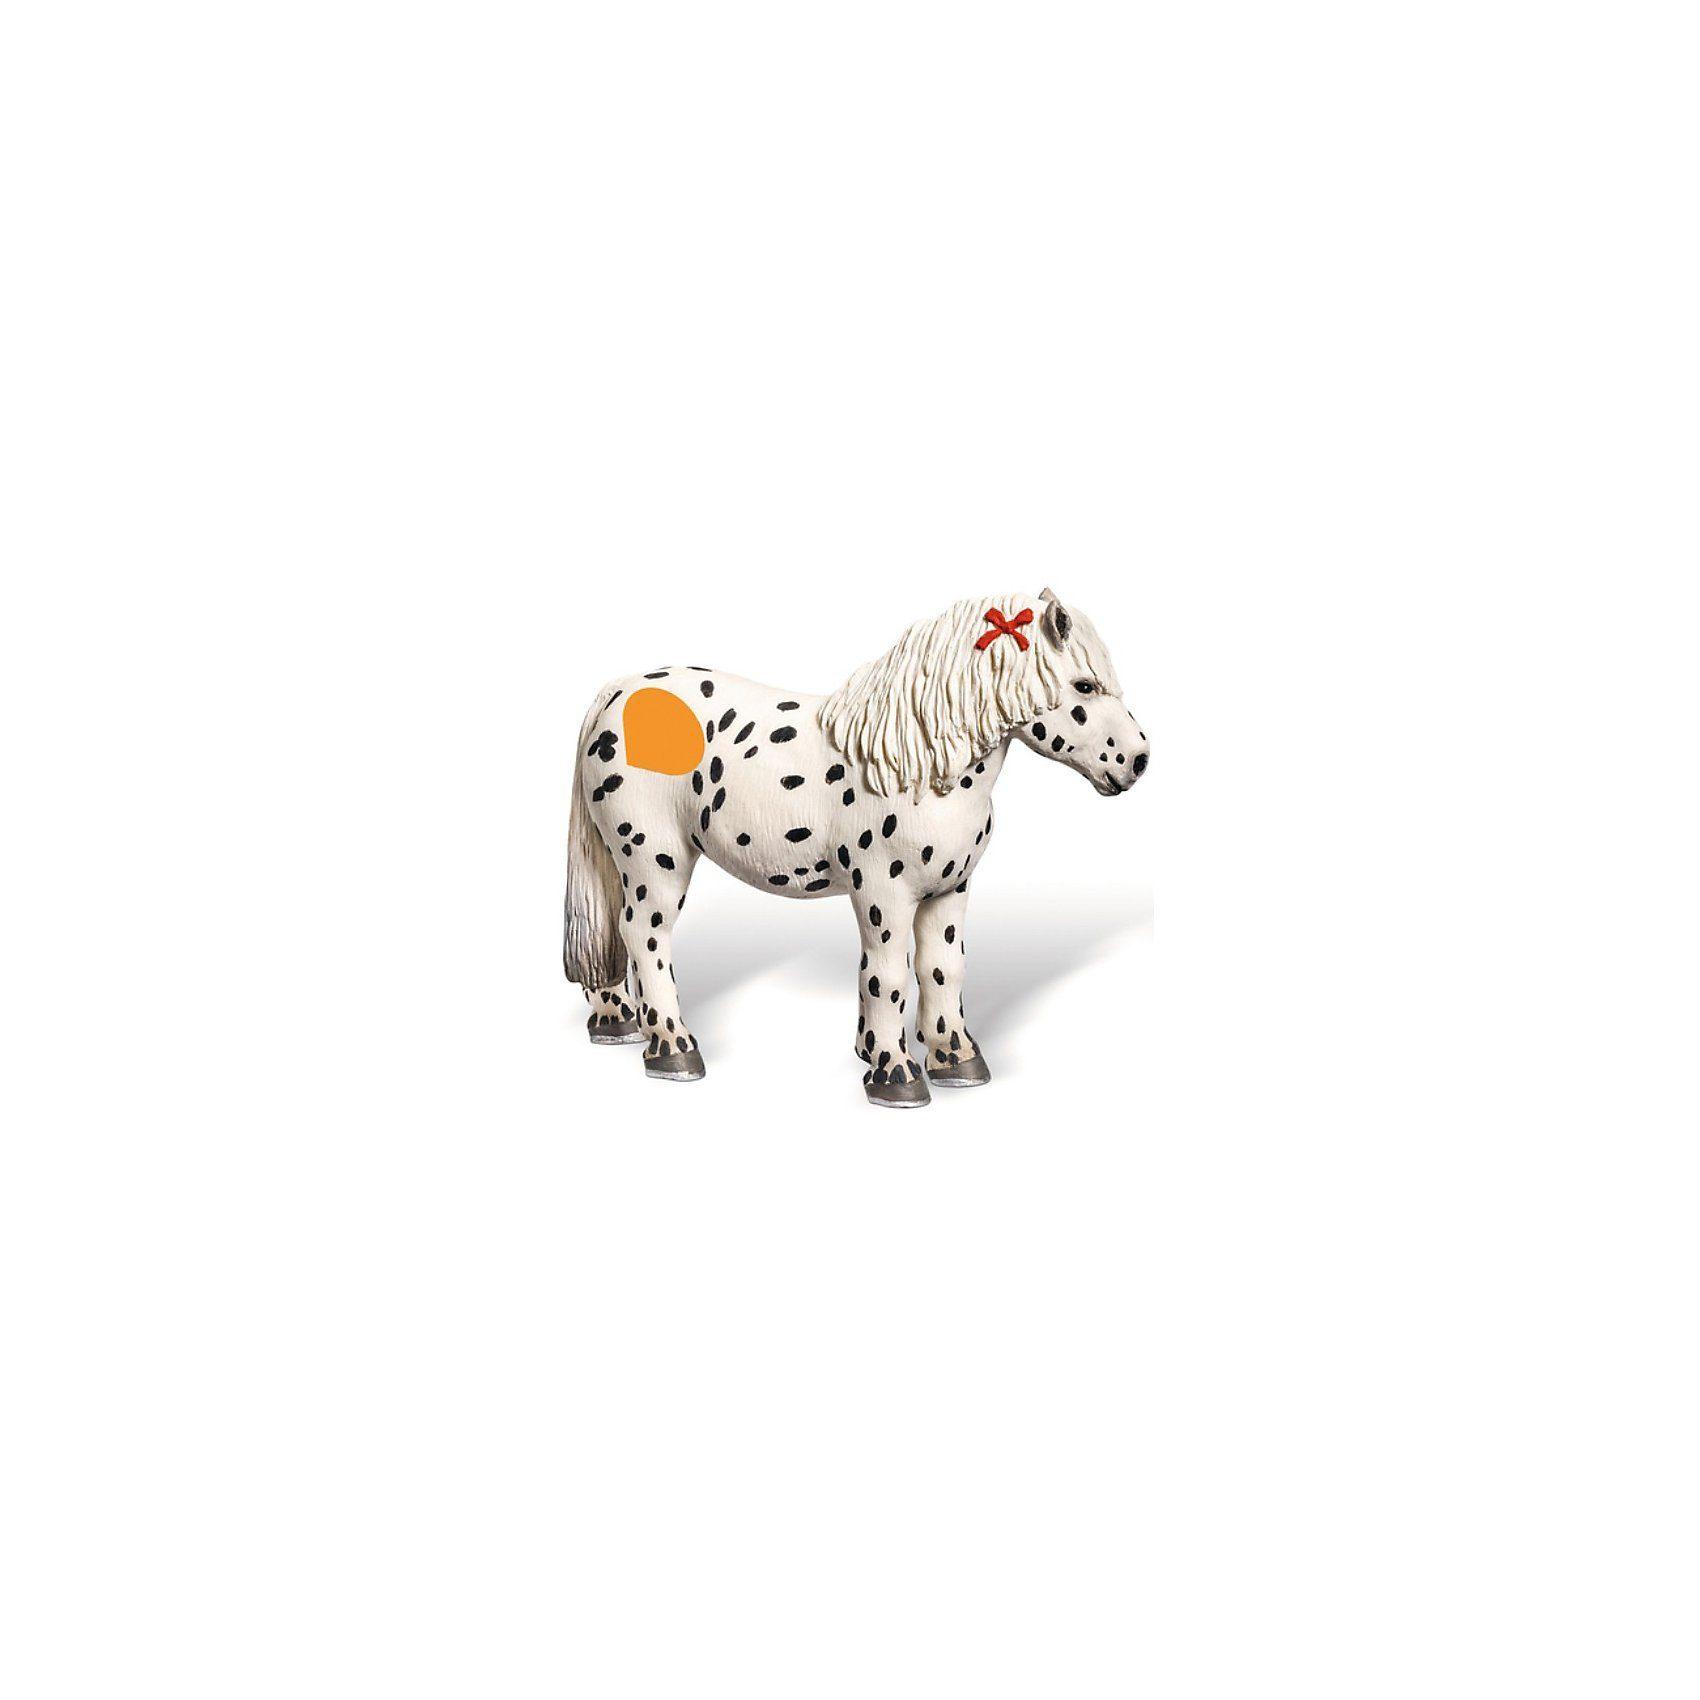 Ravensburger tiptoi® Spielfigur Appaloosa Pony